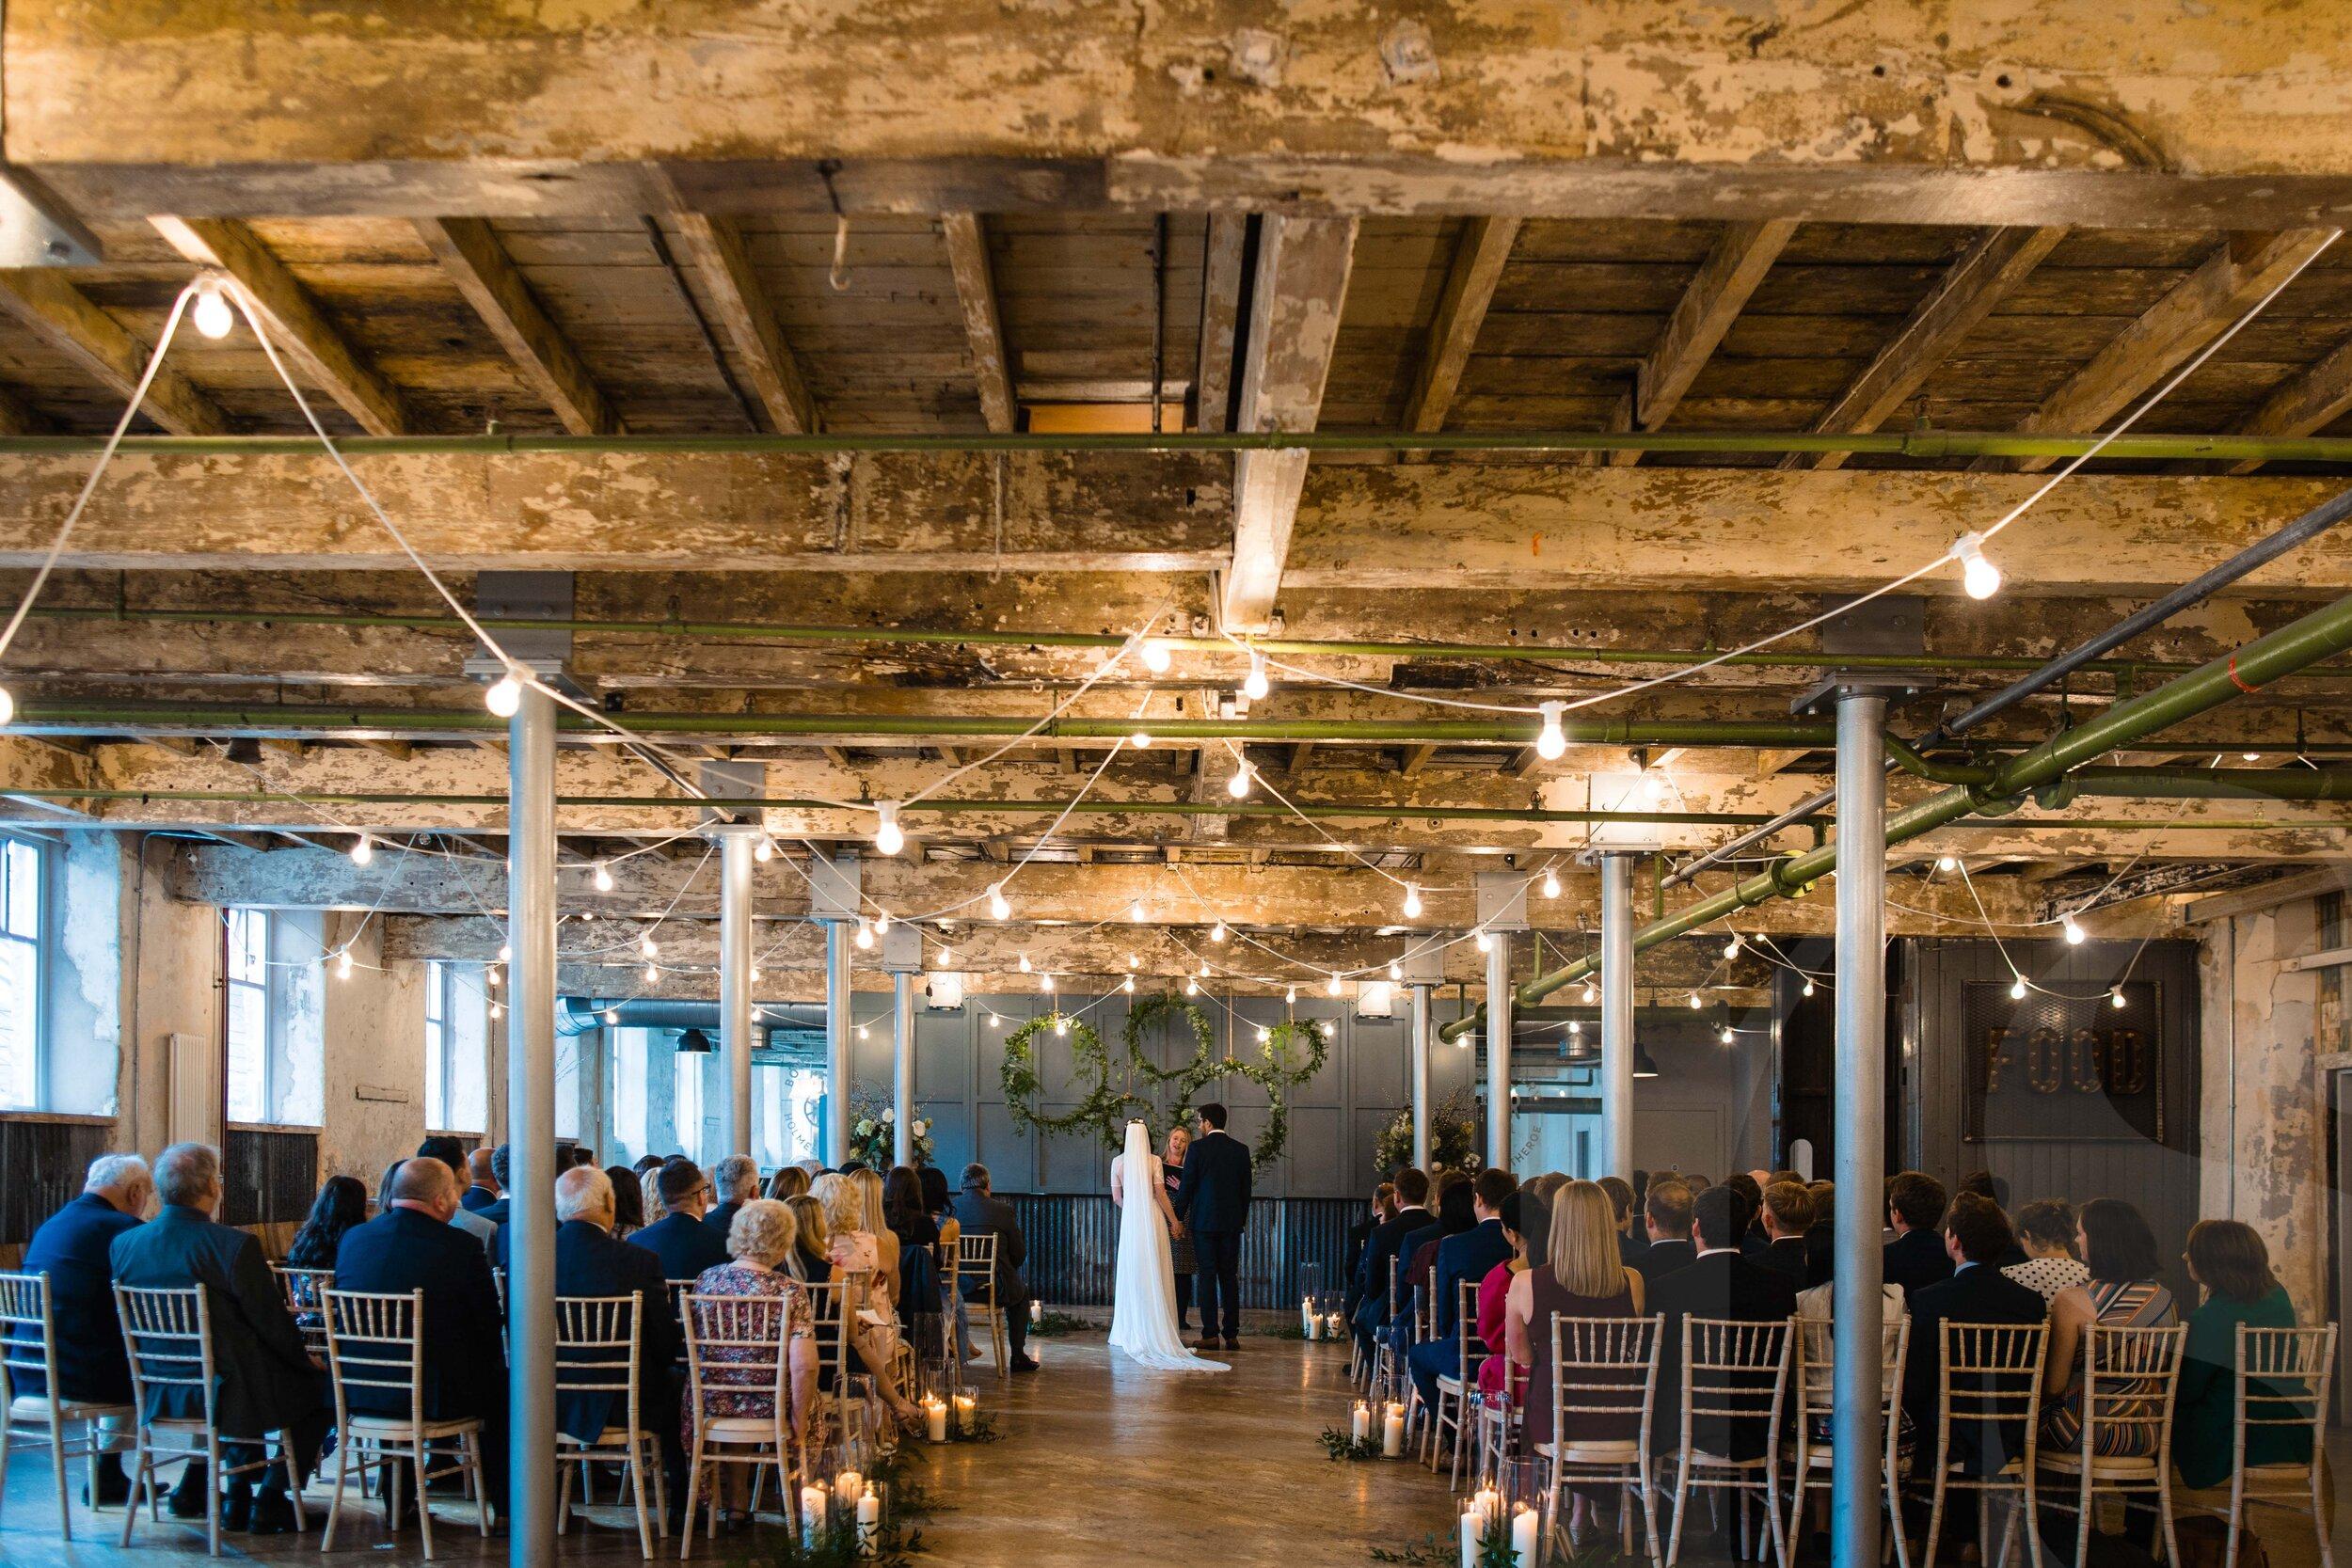 holmes-mill-clitheroe-wedding-photography-1.jpg